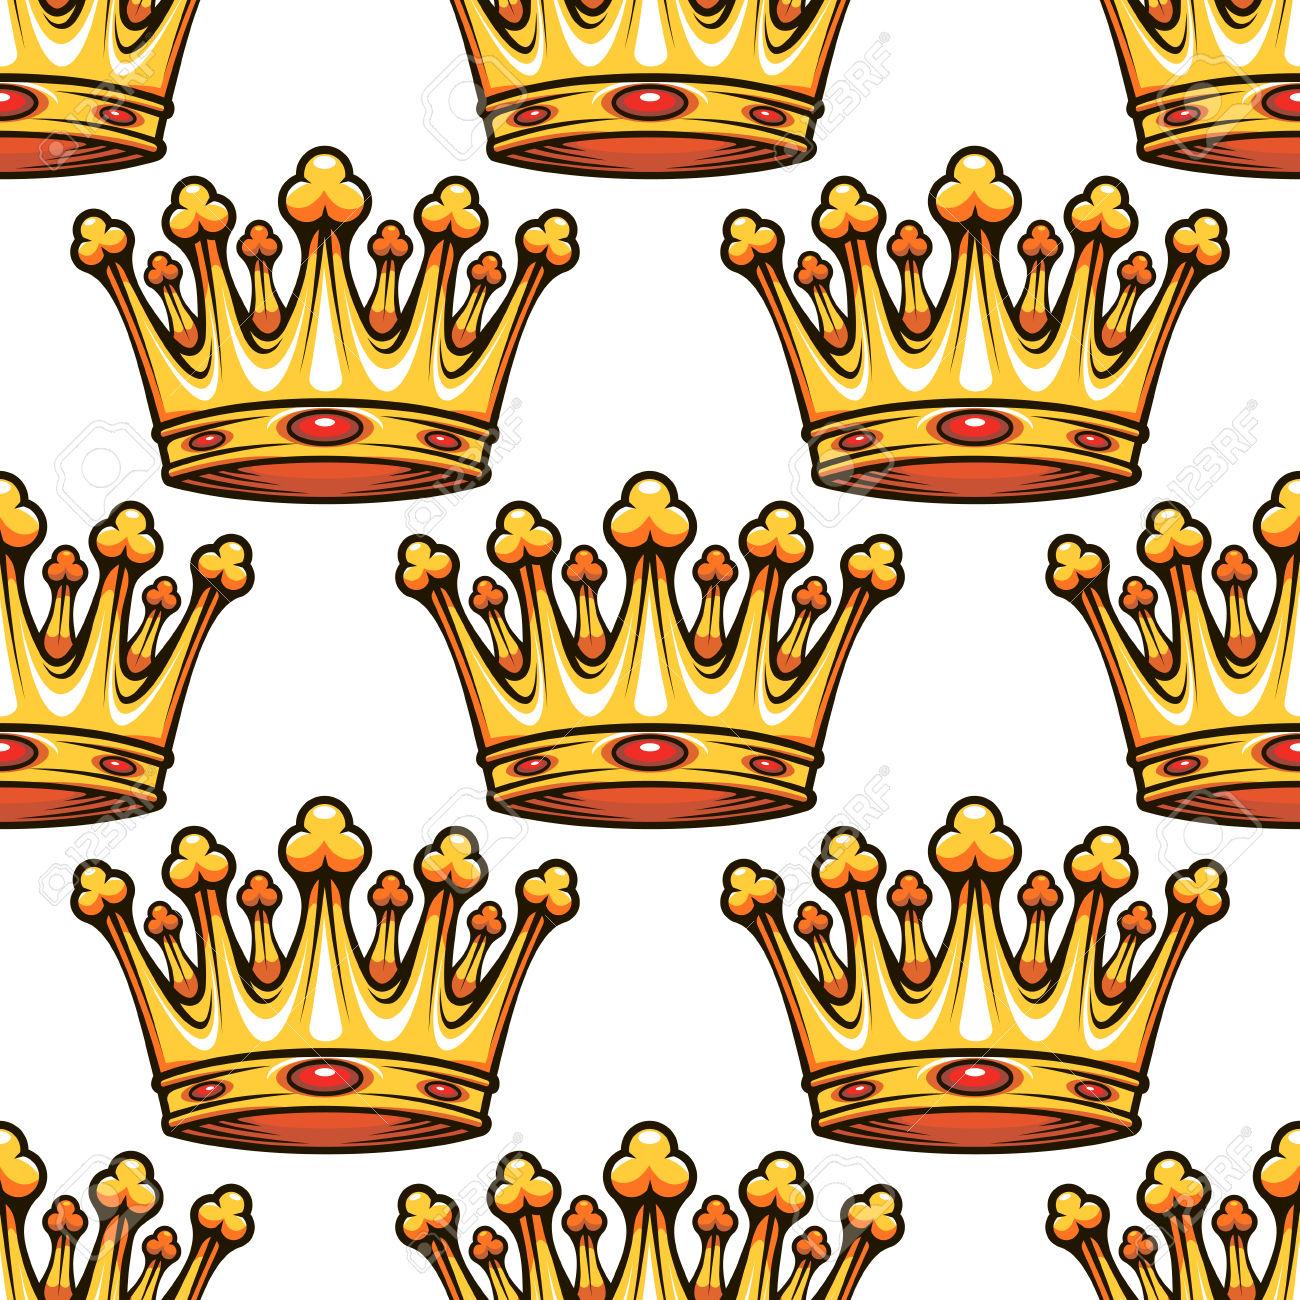 1300x1300 Crown Clipart Wallpaper